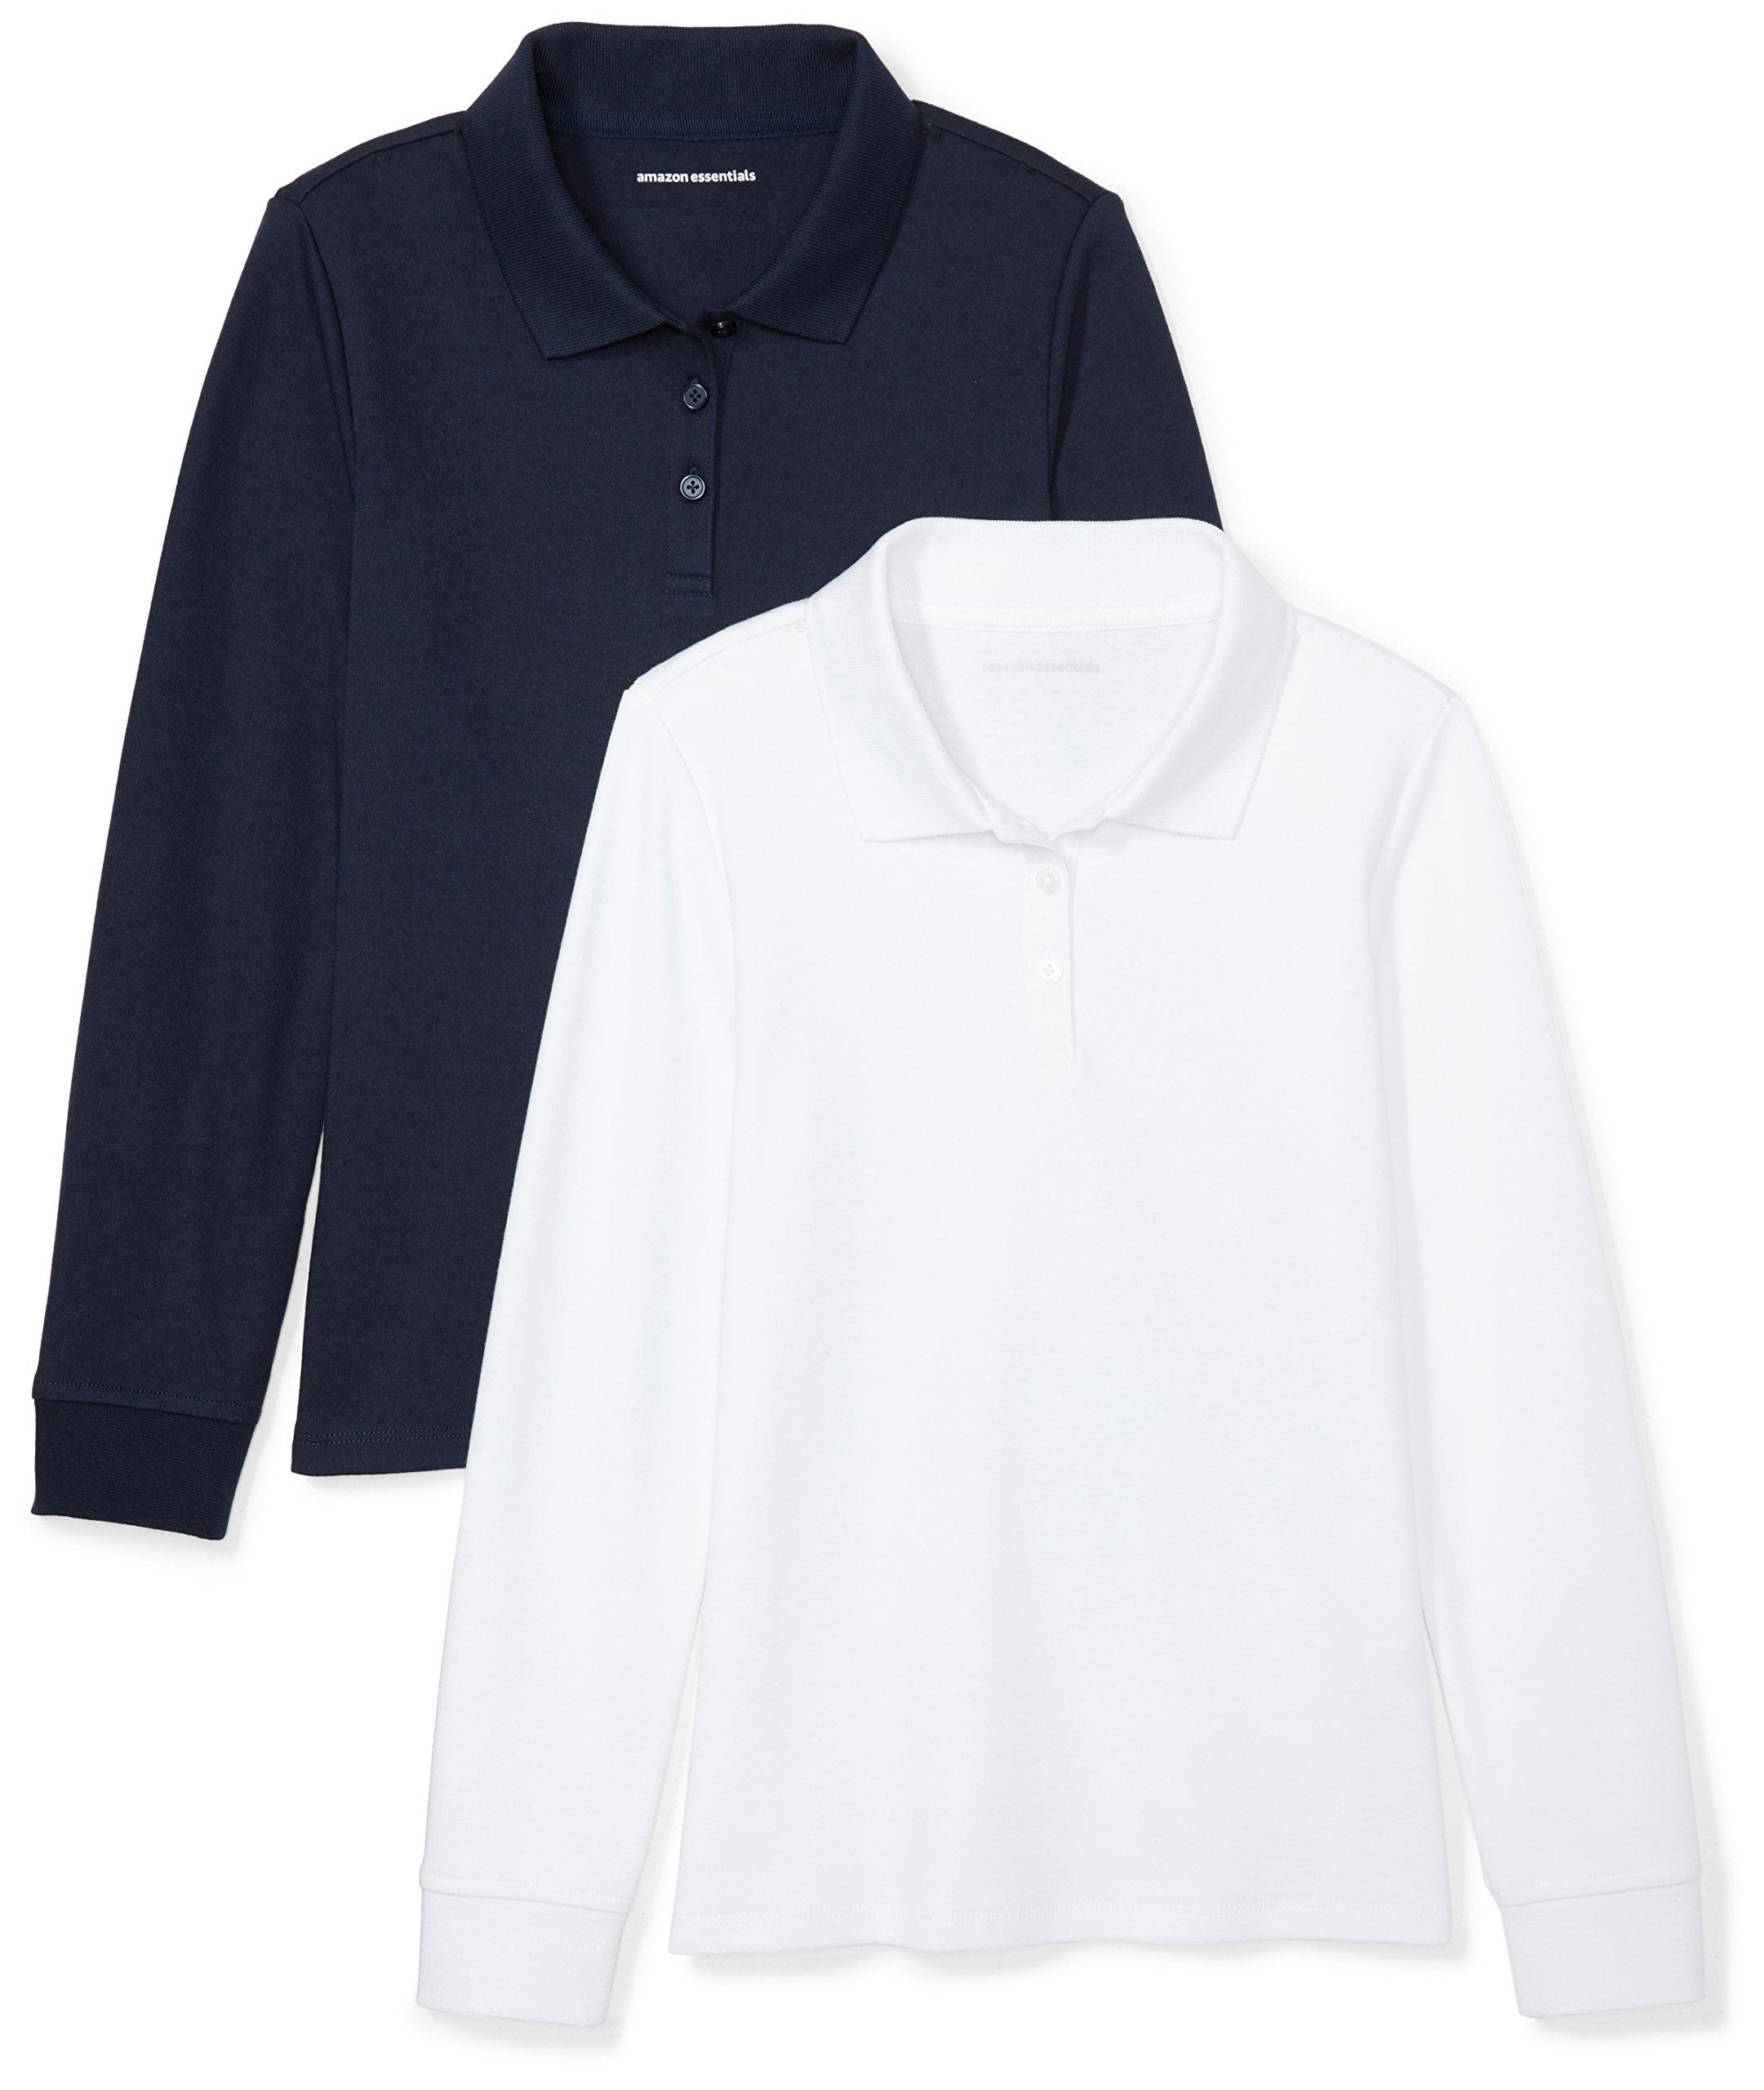 Amazon Essentials Girls' 2-Pack Long-Sleeve Interlock Polo Shirt, Navy/White, M (8) by Amazon Essentials